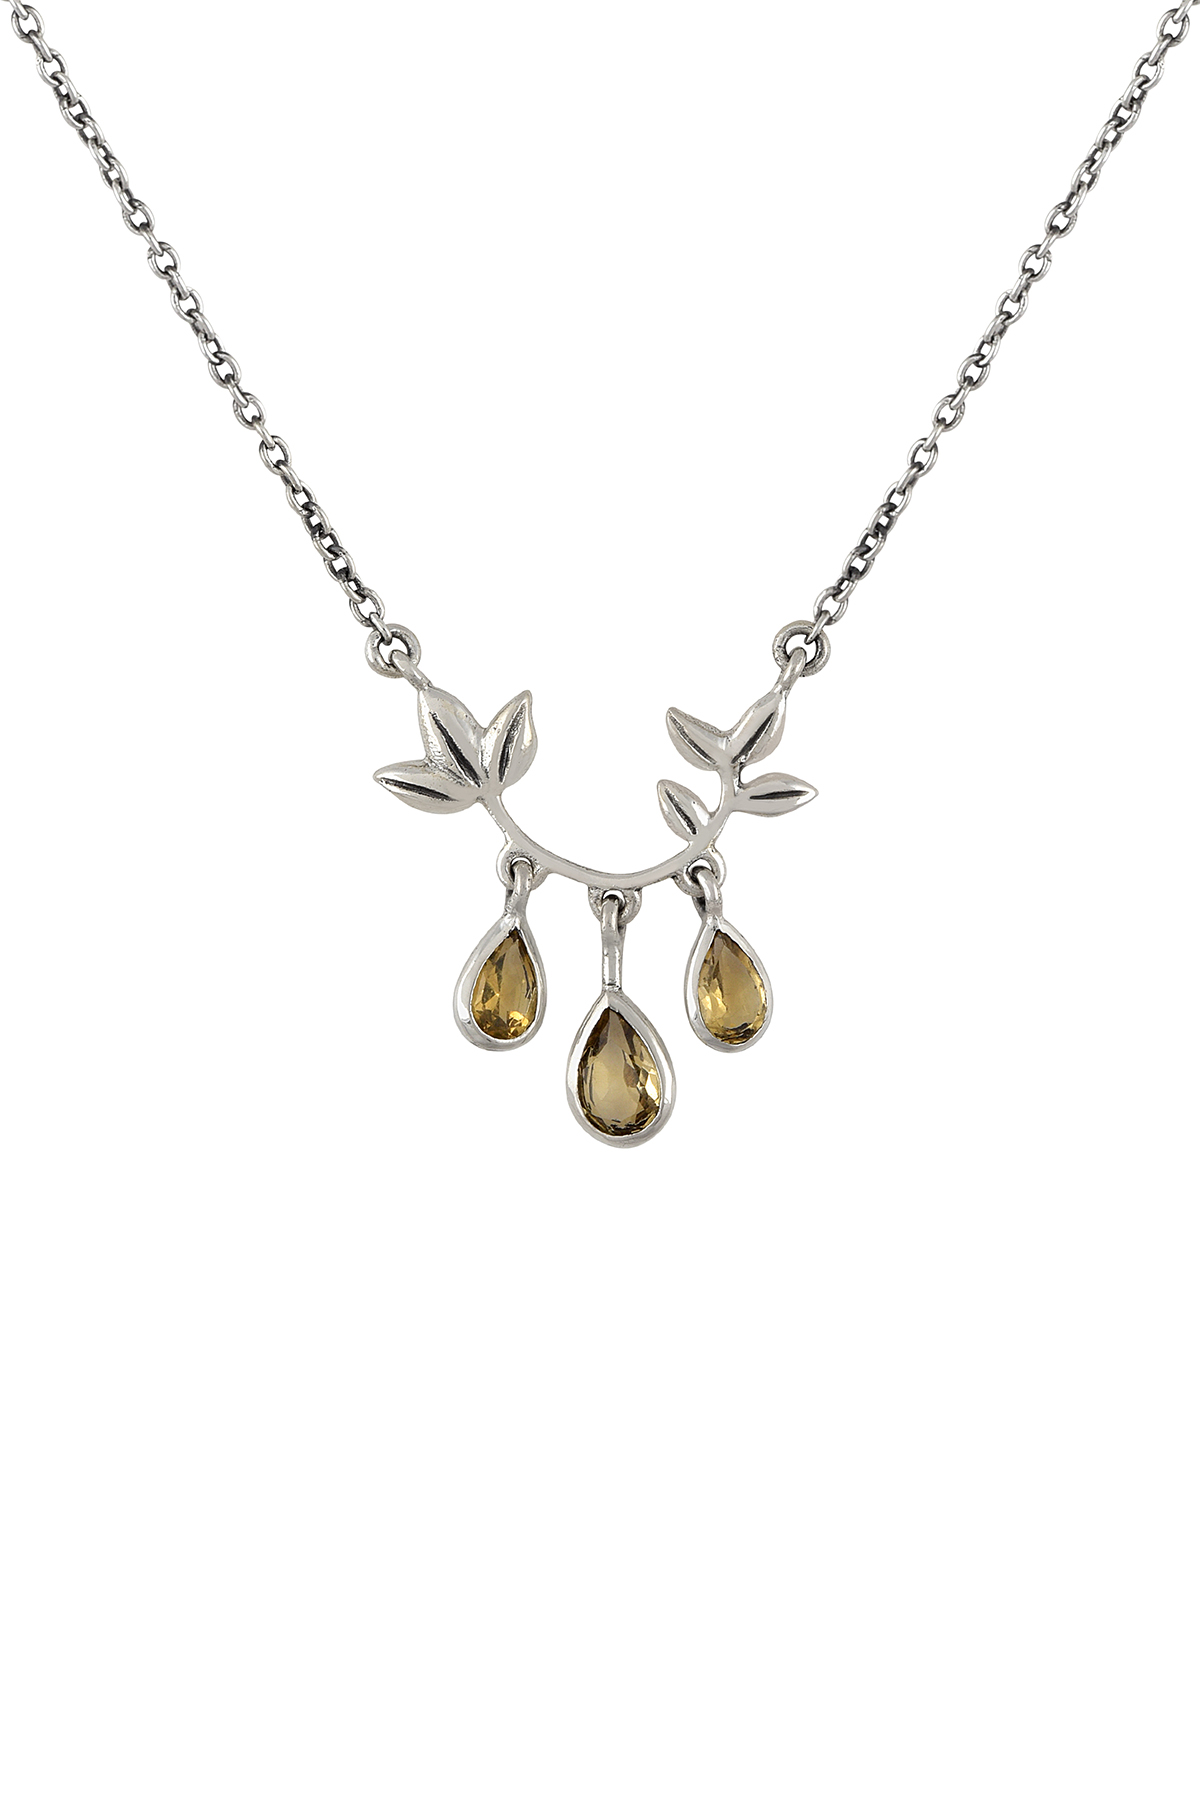 Silver Floral Citrine Drops Pendant